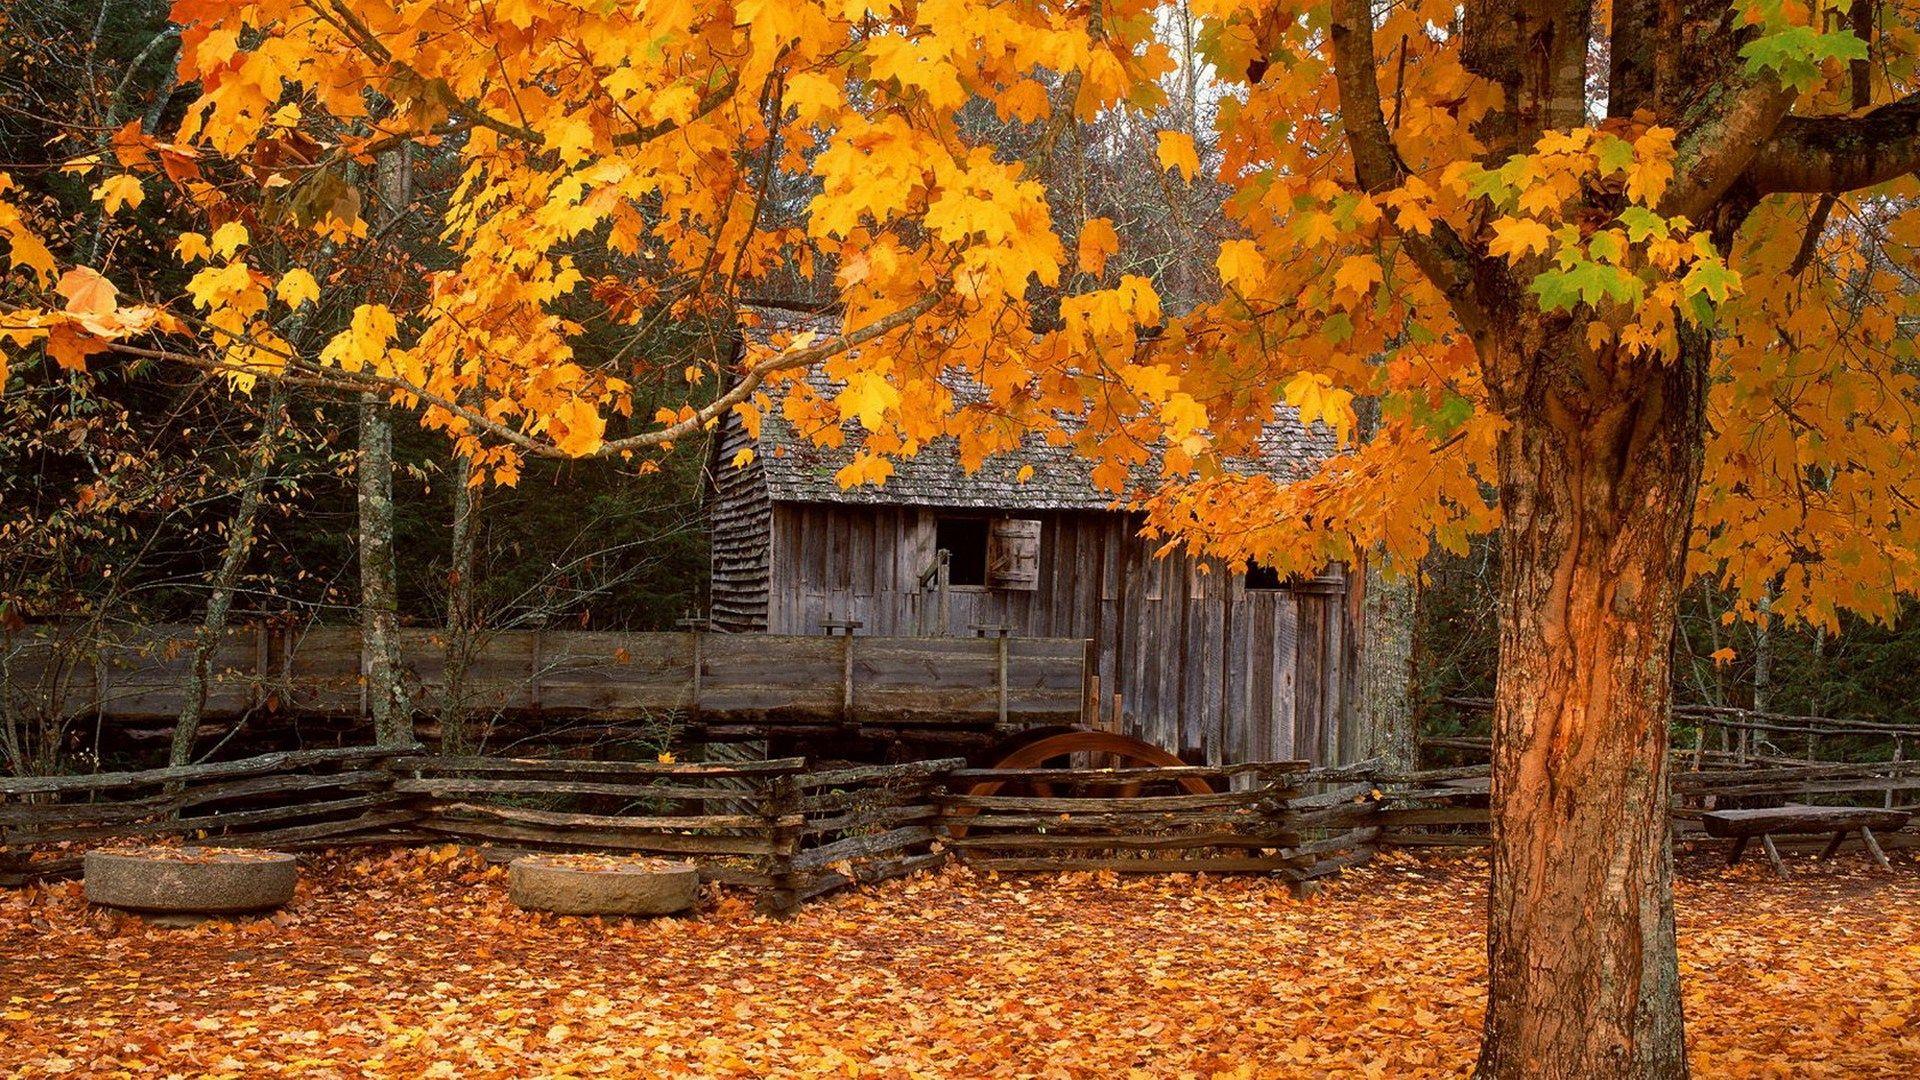 Autumn Screensavers Backgrounds